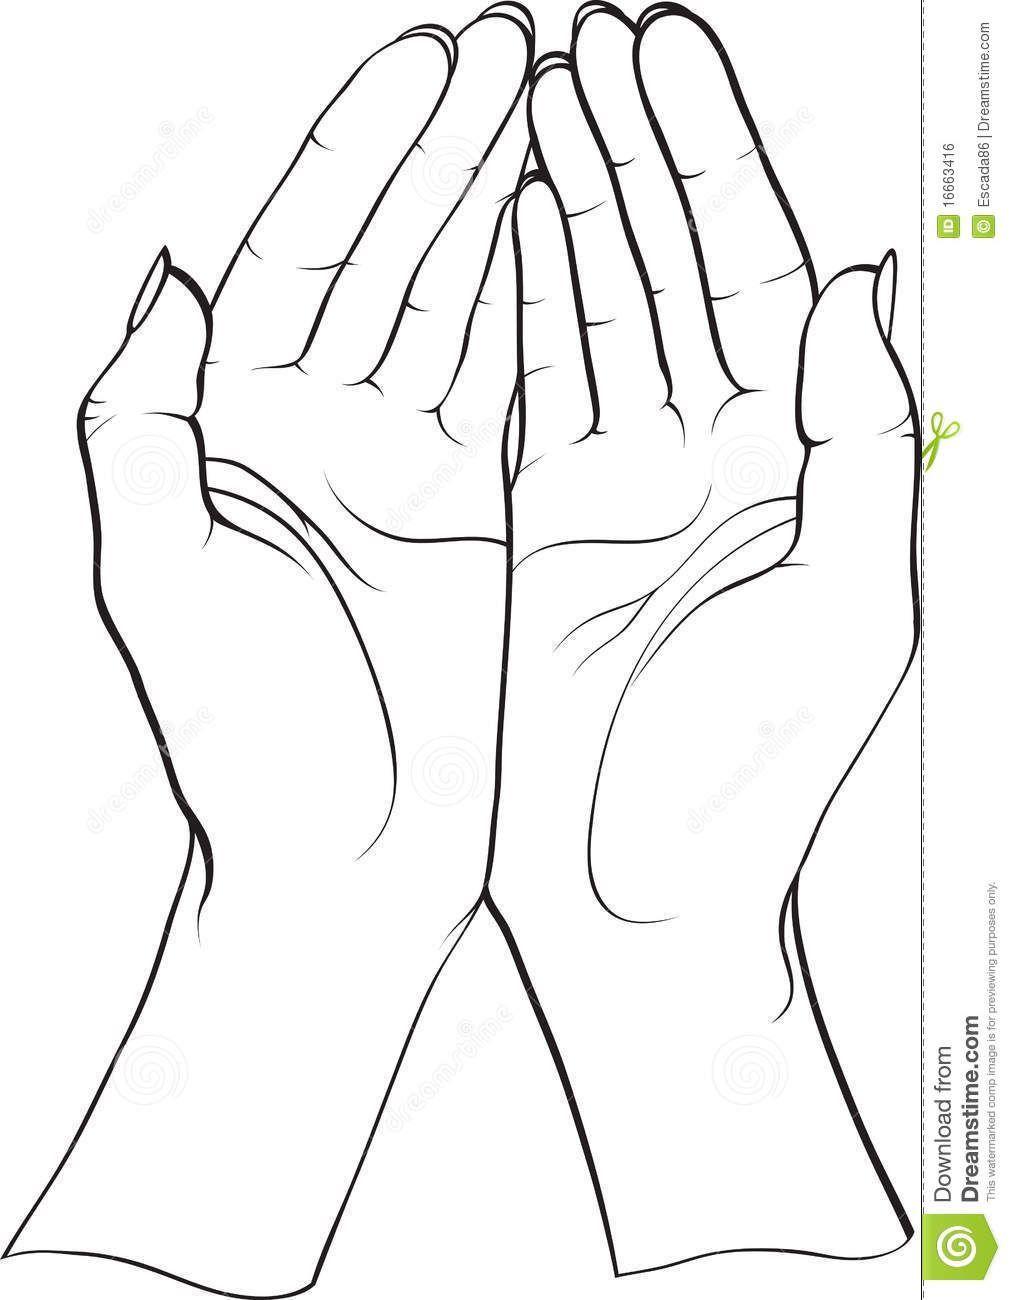 Open Praying Hands Clipart Clipart Panda Free Clipart Images Hand Clipart Hand Silhouette Hand Art Drawing